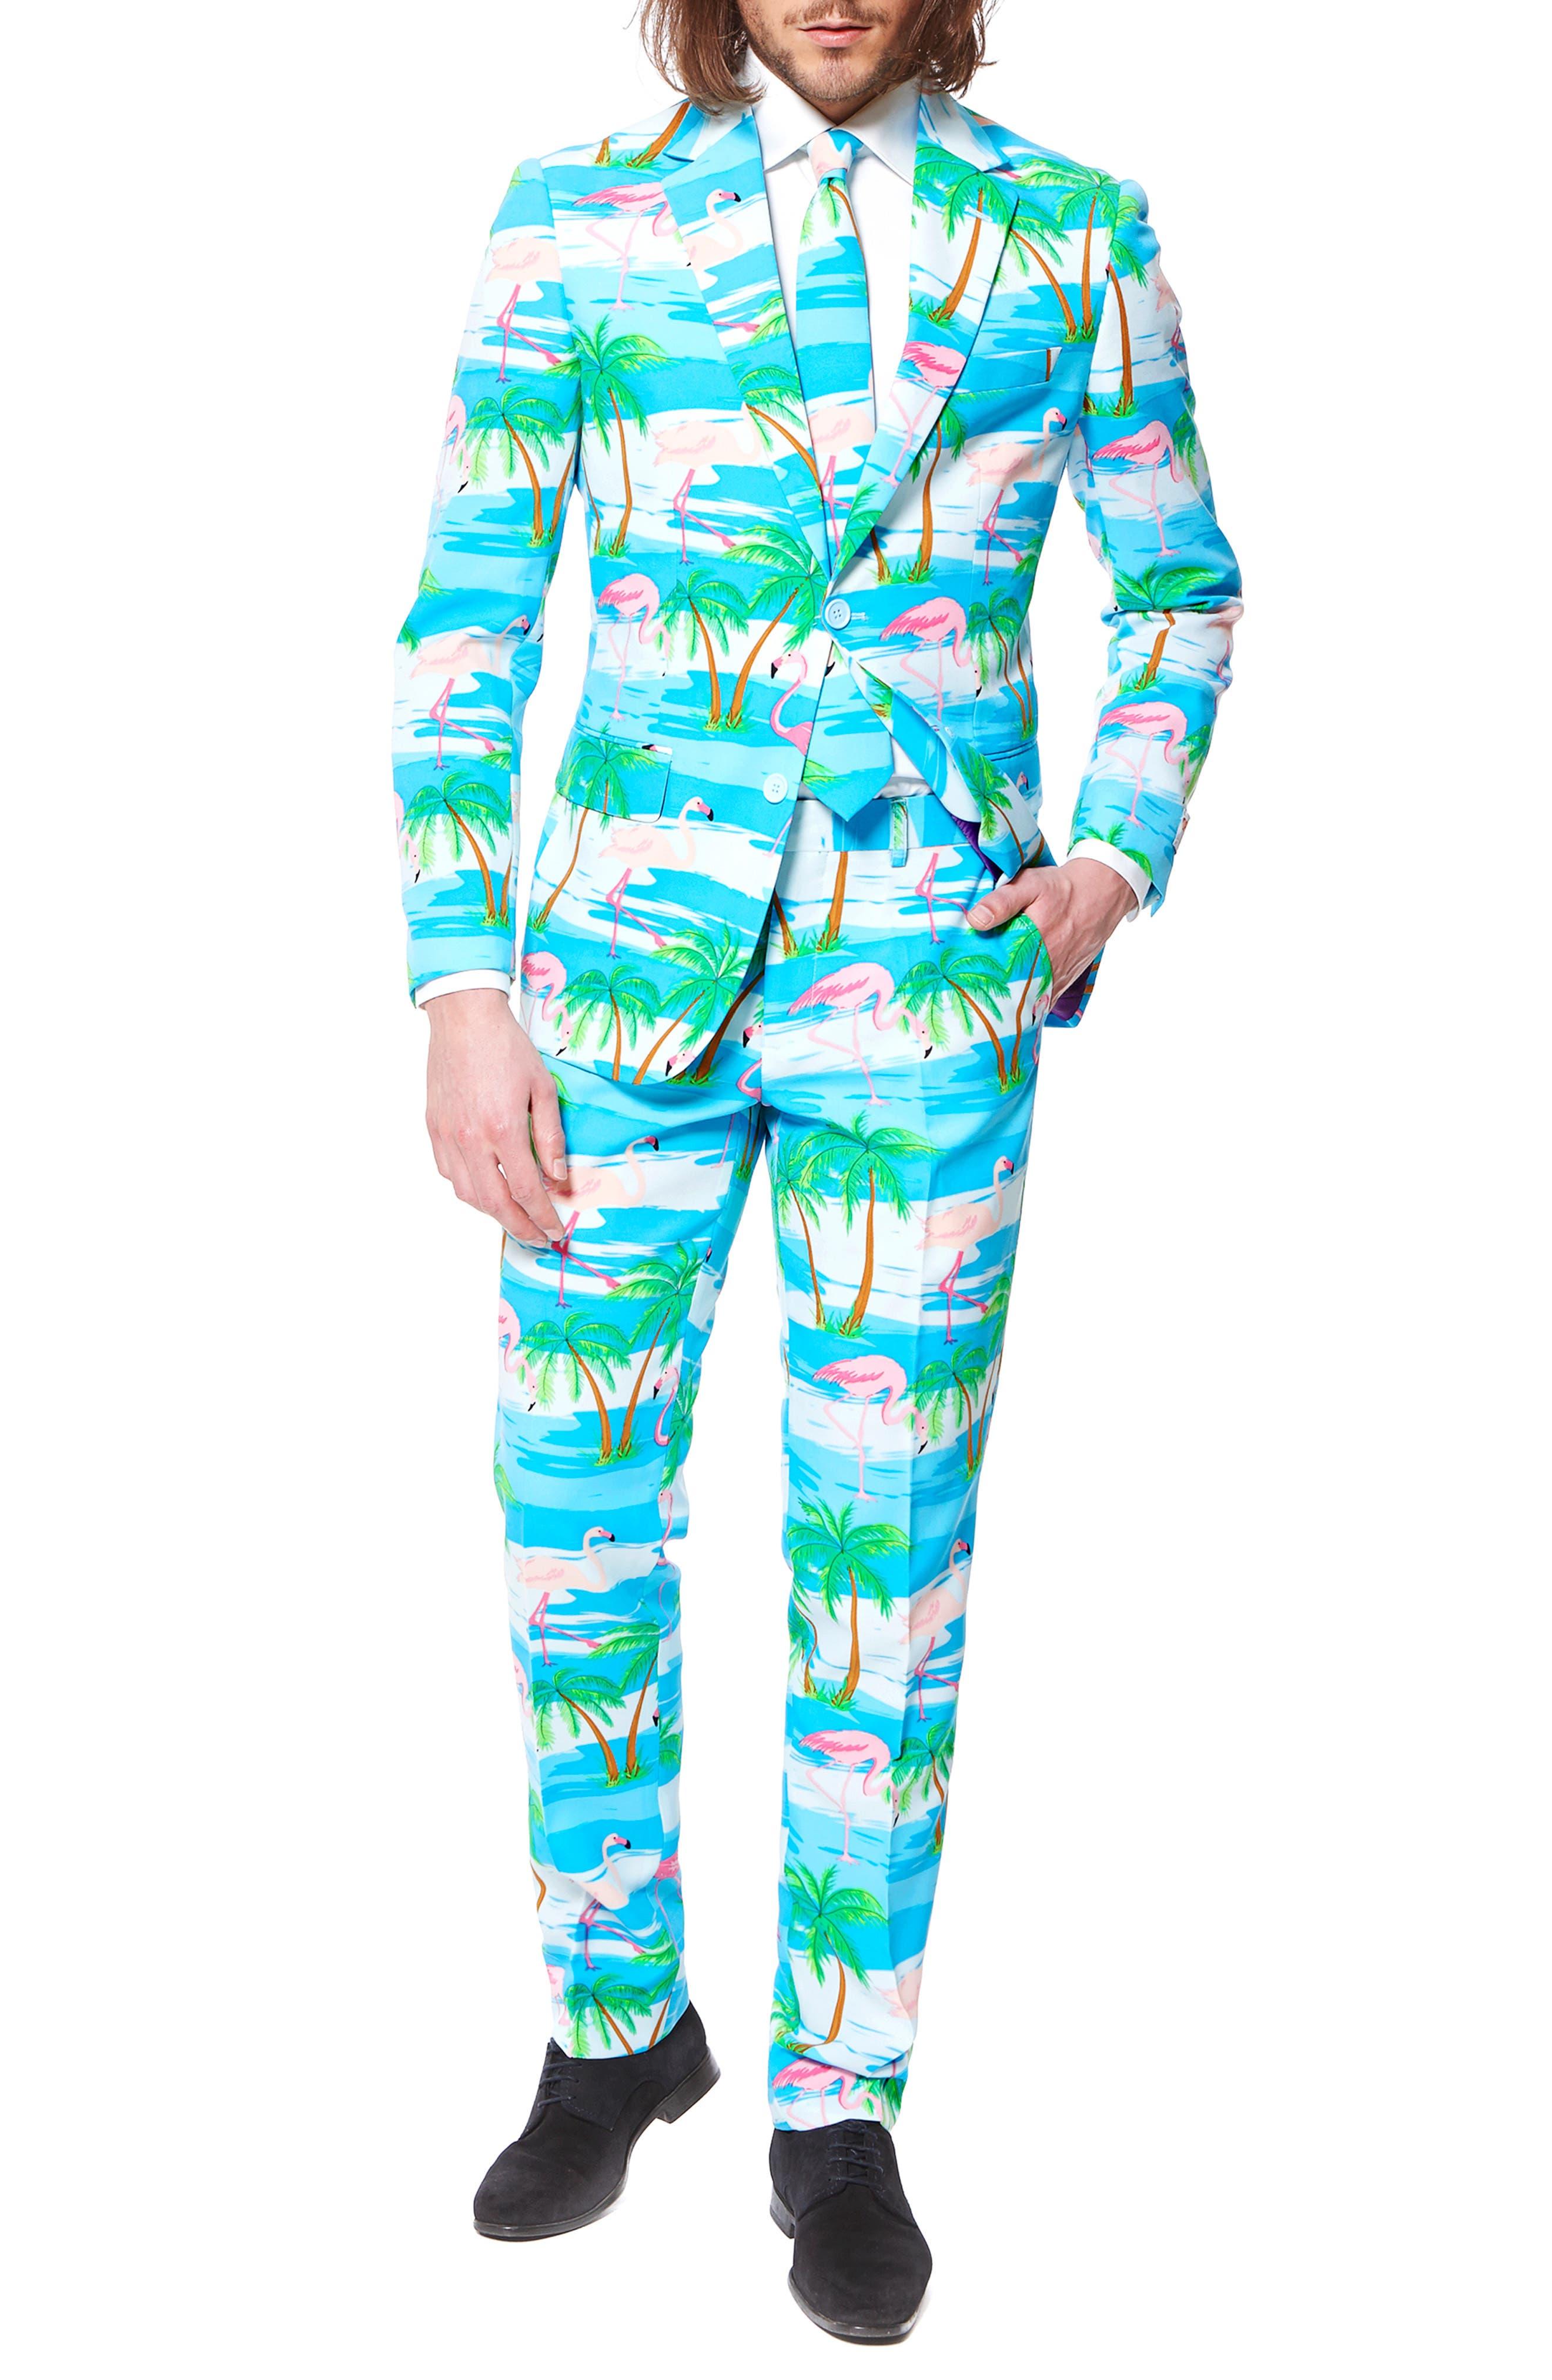 'Flaminguy' Trim Fit Two-Piece Suit with Tie,                             Alternate thumbnail 4, color,                             400